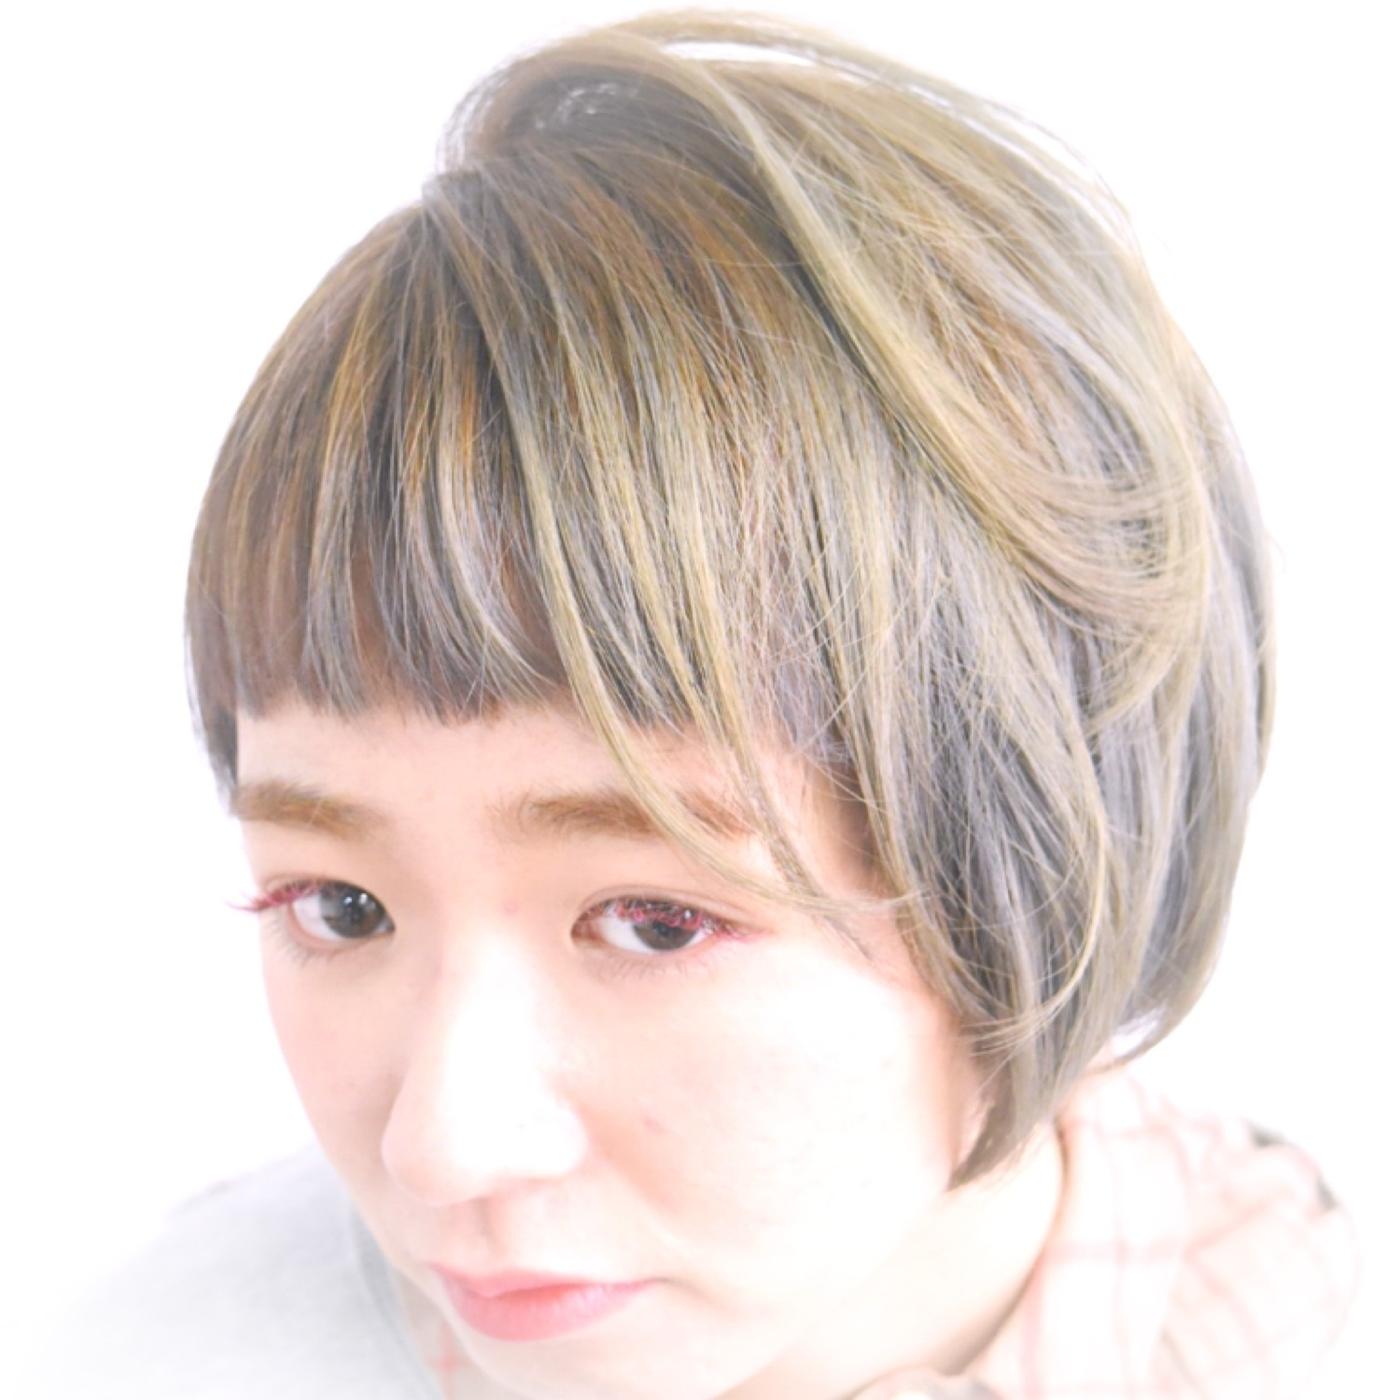 Masahikoが投稿した画像